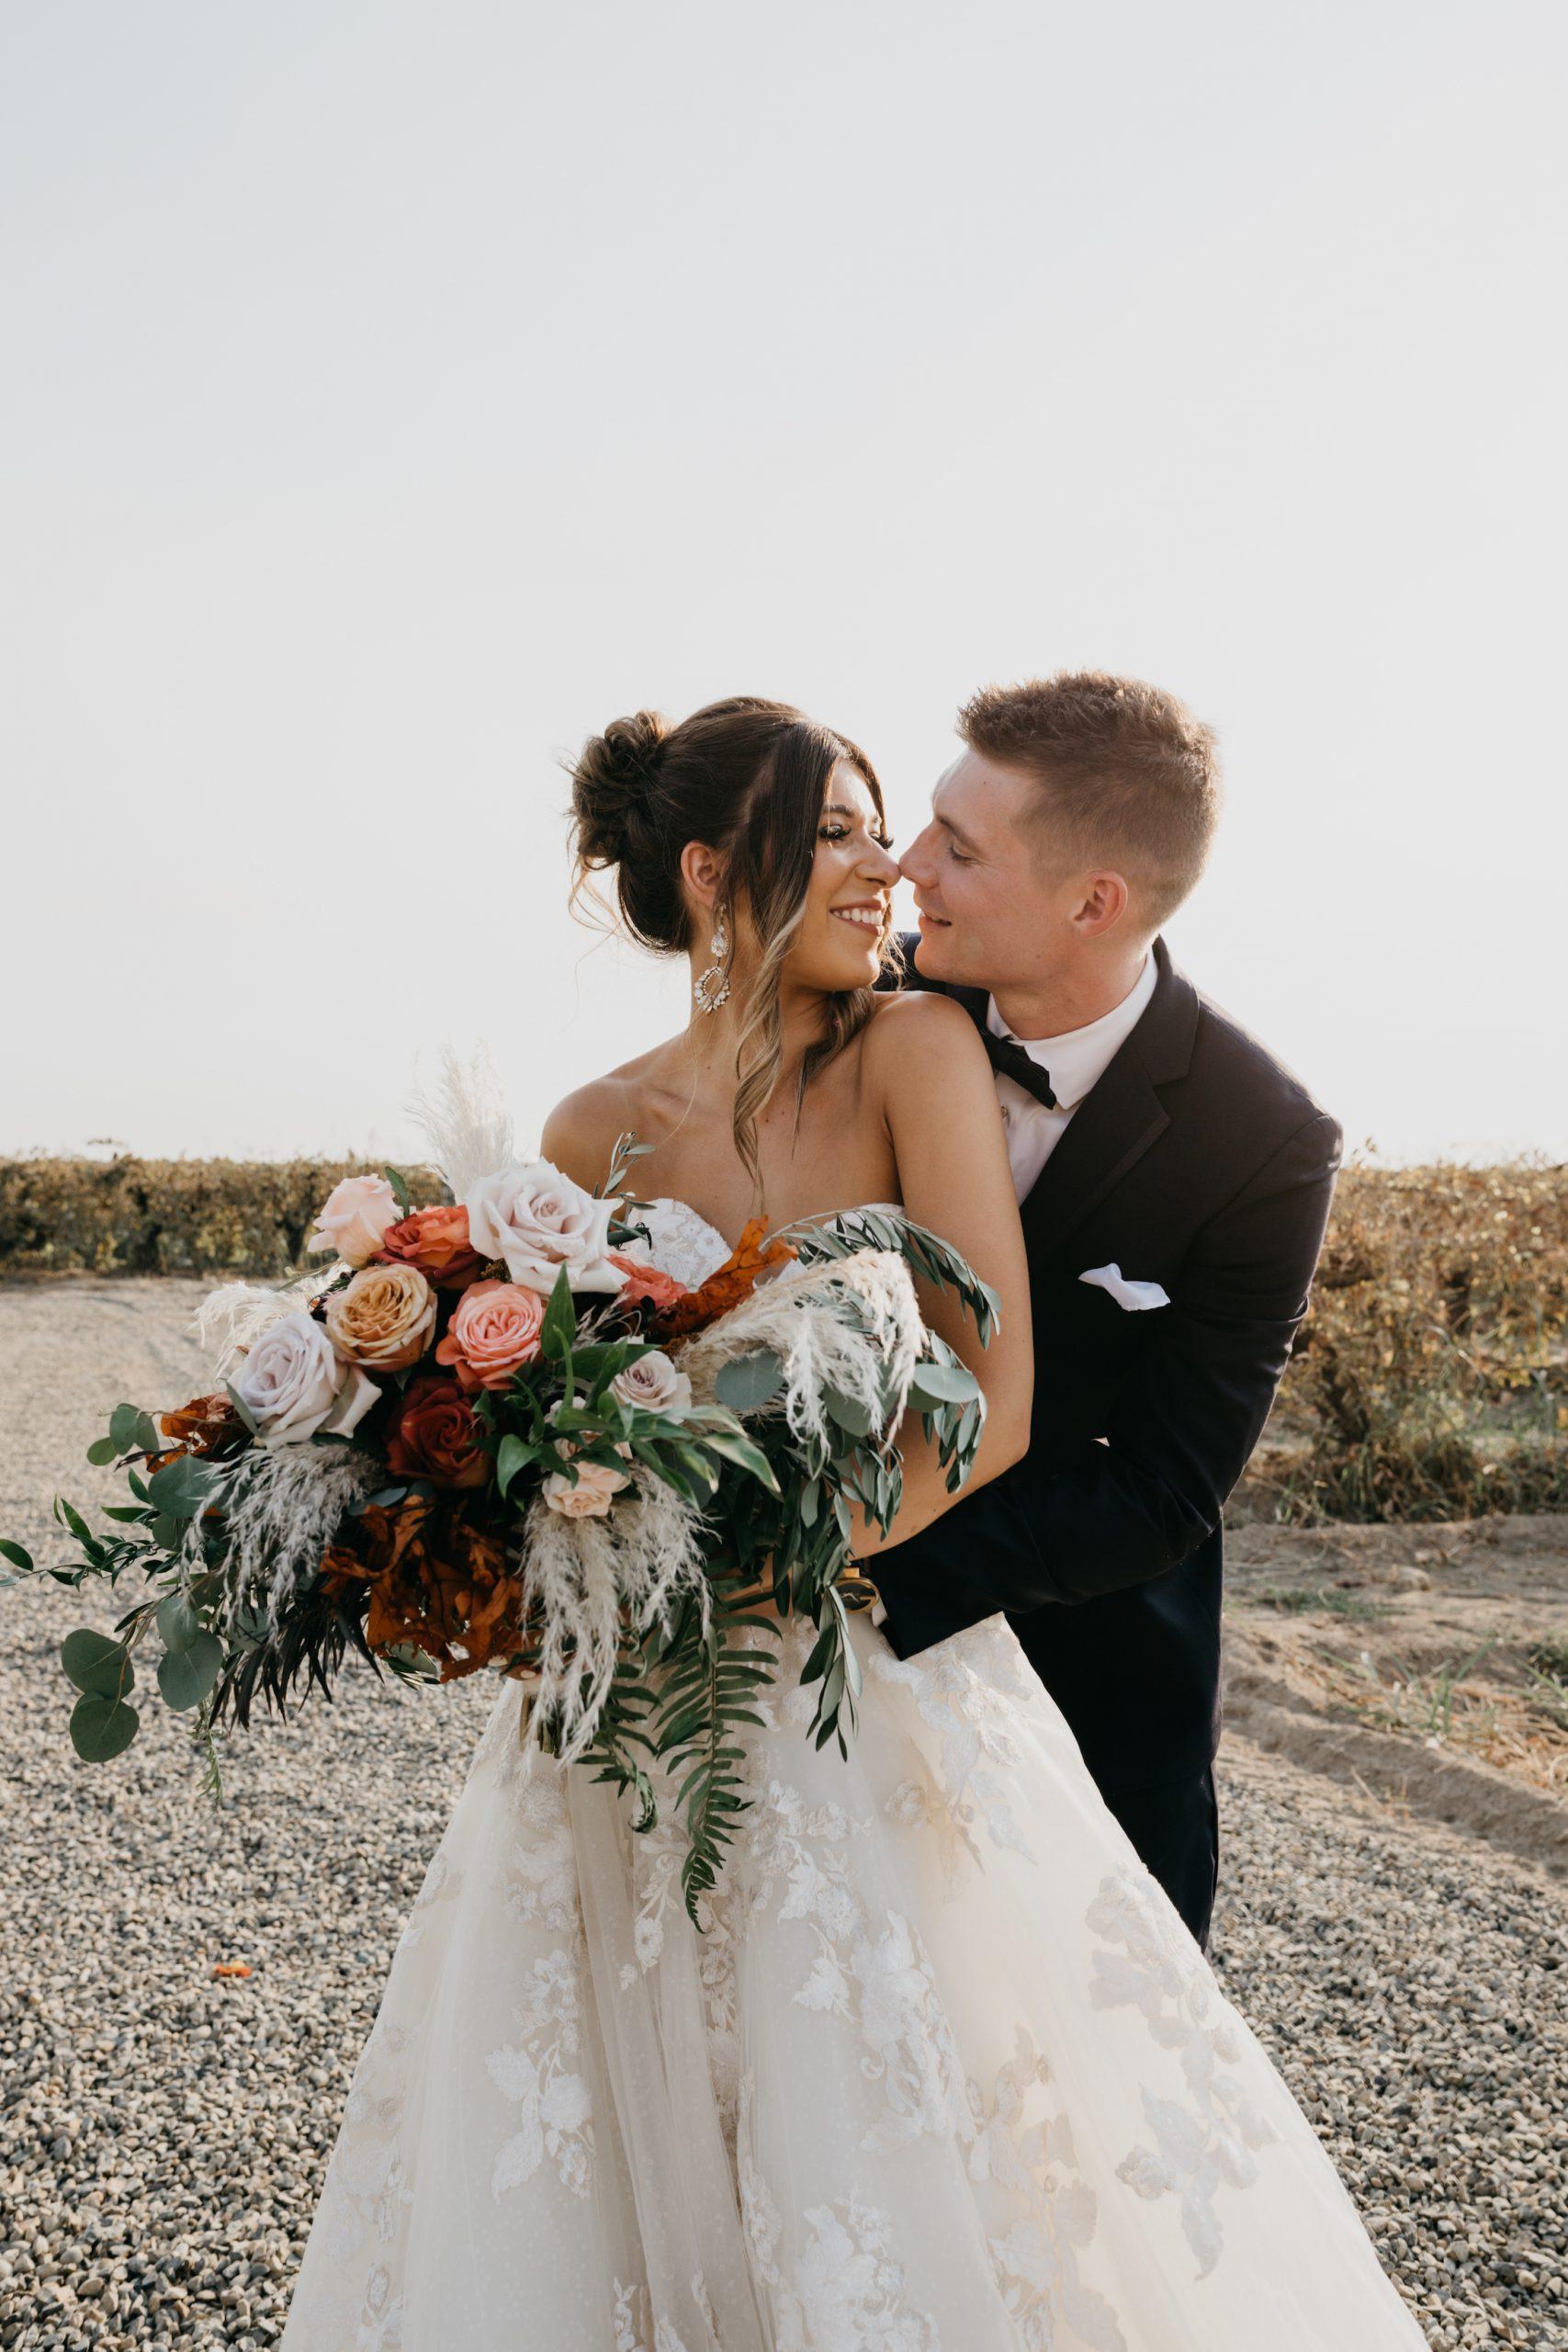 Evanelle Vineyards Wedding Bride and Groom Portraits, image by Fatima Elreda Photo